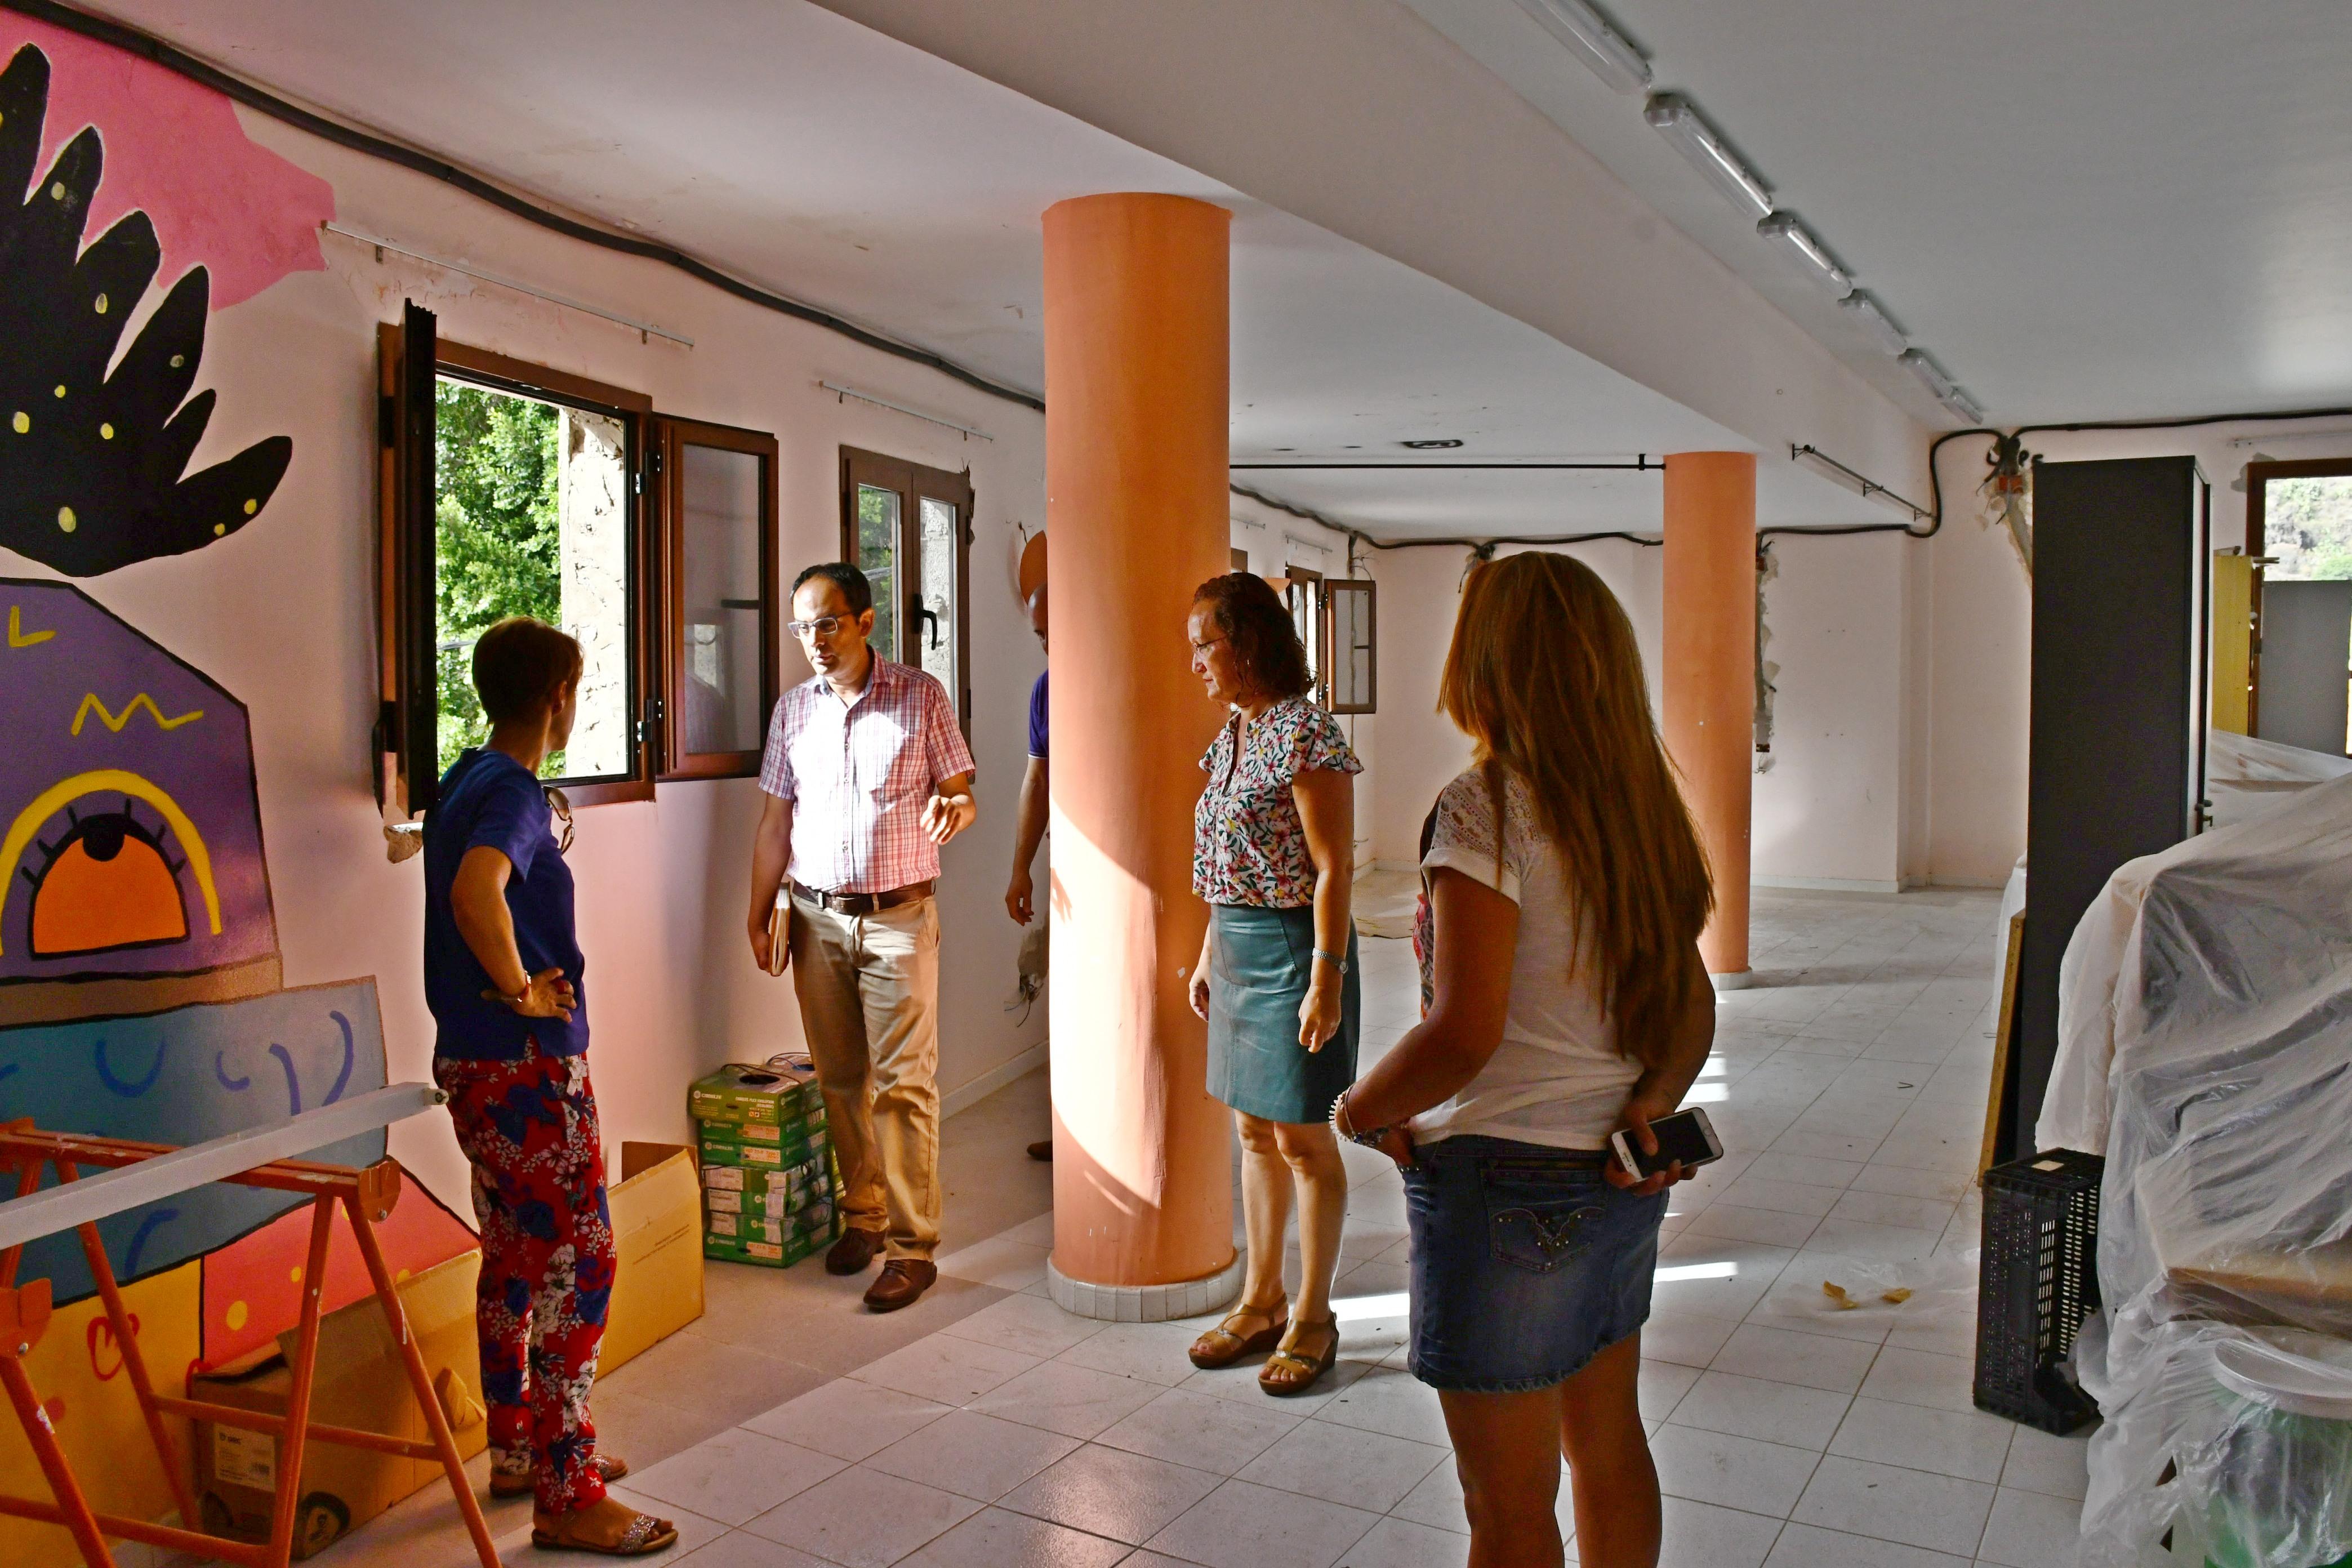 En marcha la obras mejora del Centro Sociocultural de Veneguera